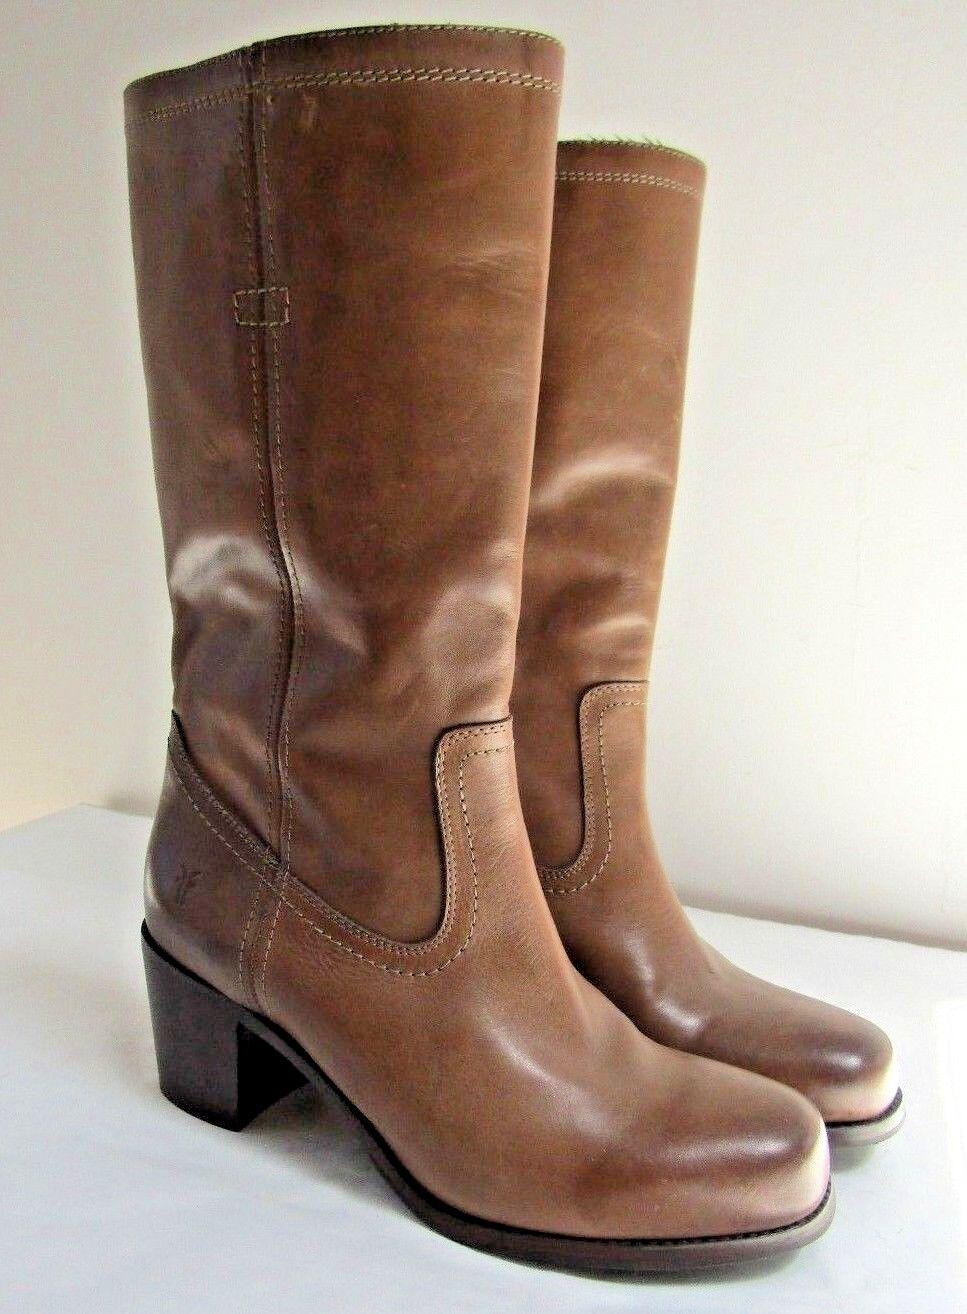 Frye  Tan  Mid- calf  Women's Boots  size 9.5 -  New